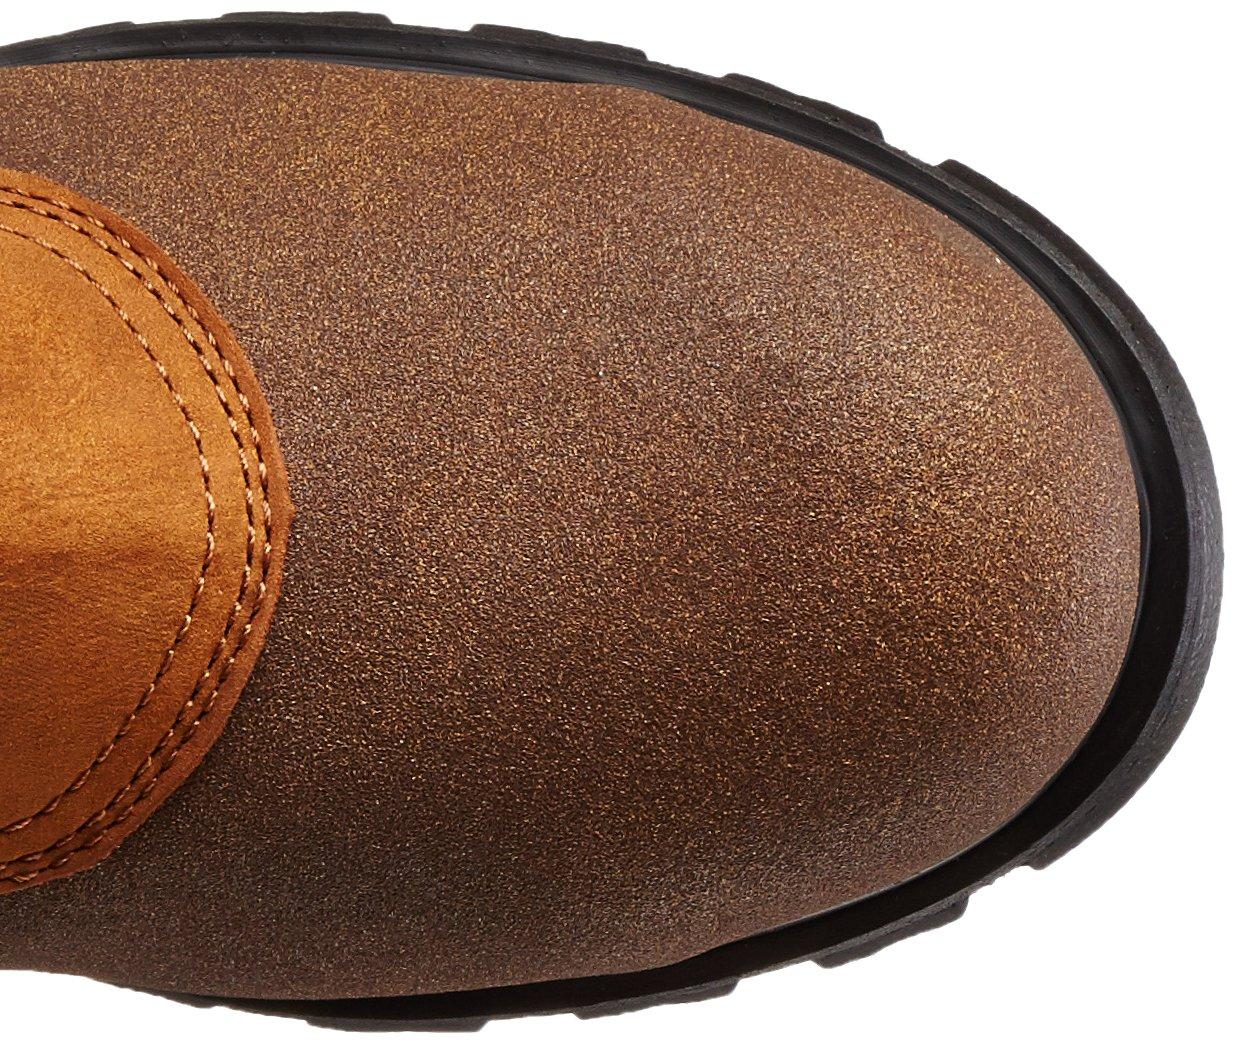 Timberland PRO Men's Rigmaster Wellington Work Shoe,Wheat Bandit,8.5 W US by Timberland PRO (Image #8)